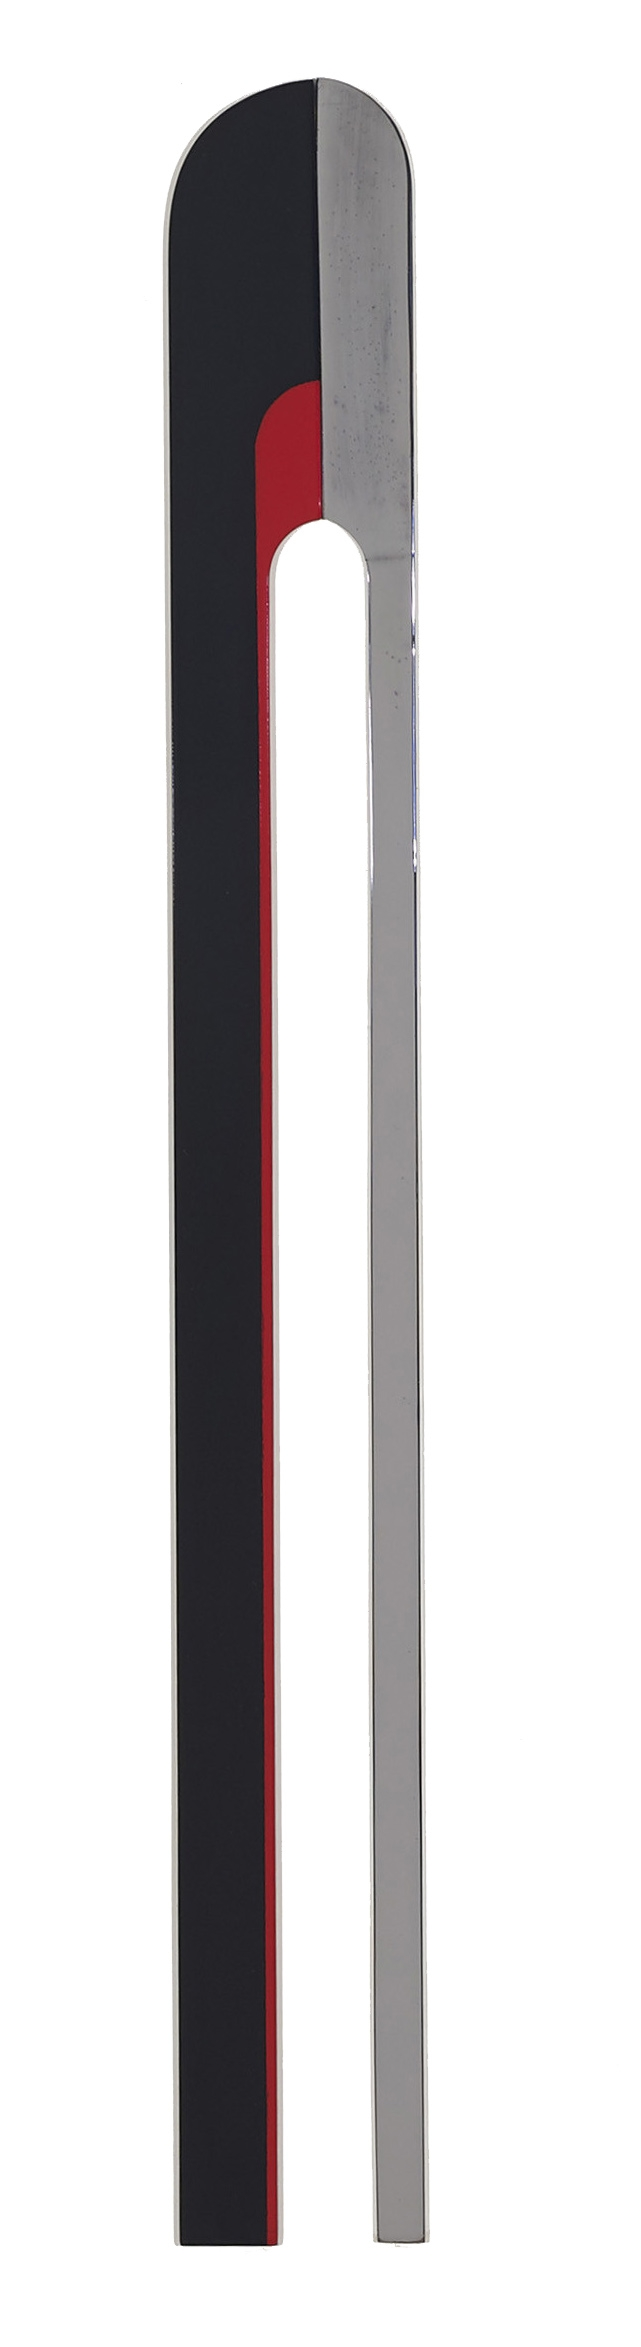 Cr114 blackpin wrightsauction2-awaitingresponsefromwrights cutout